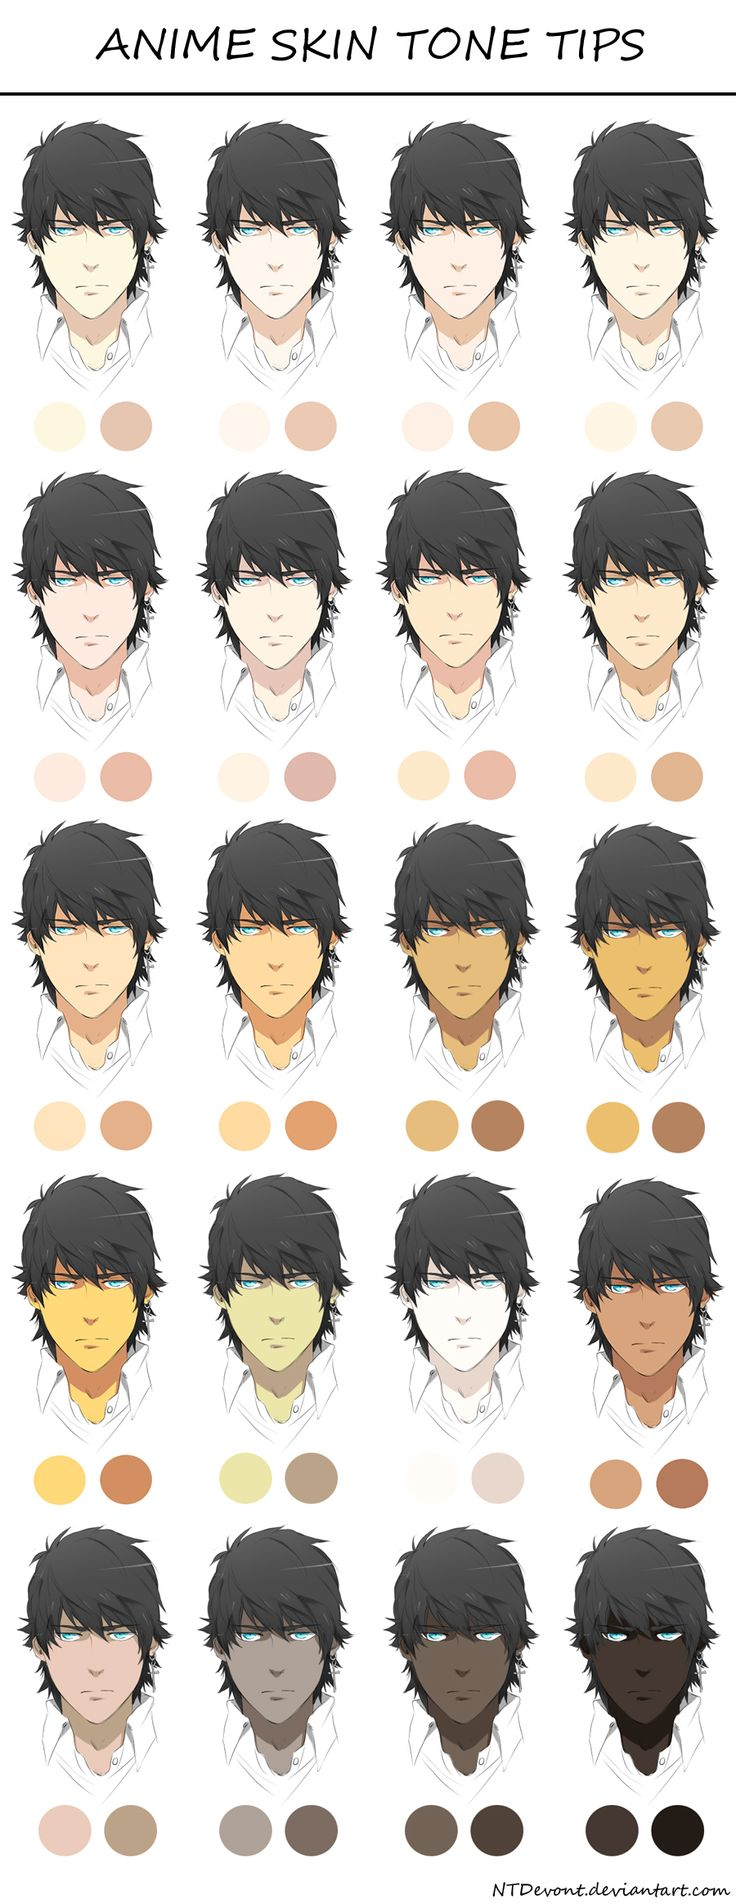 Anime Skin Tones